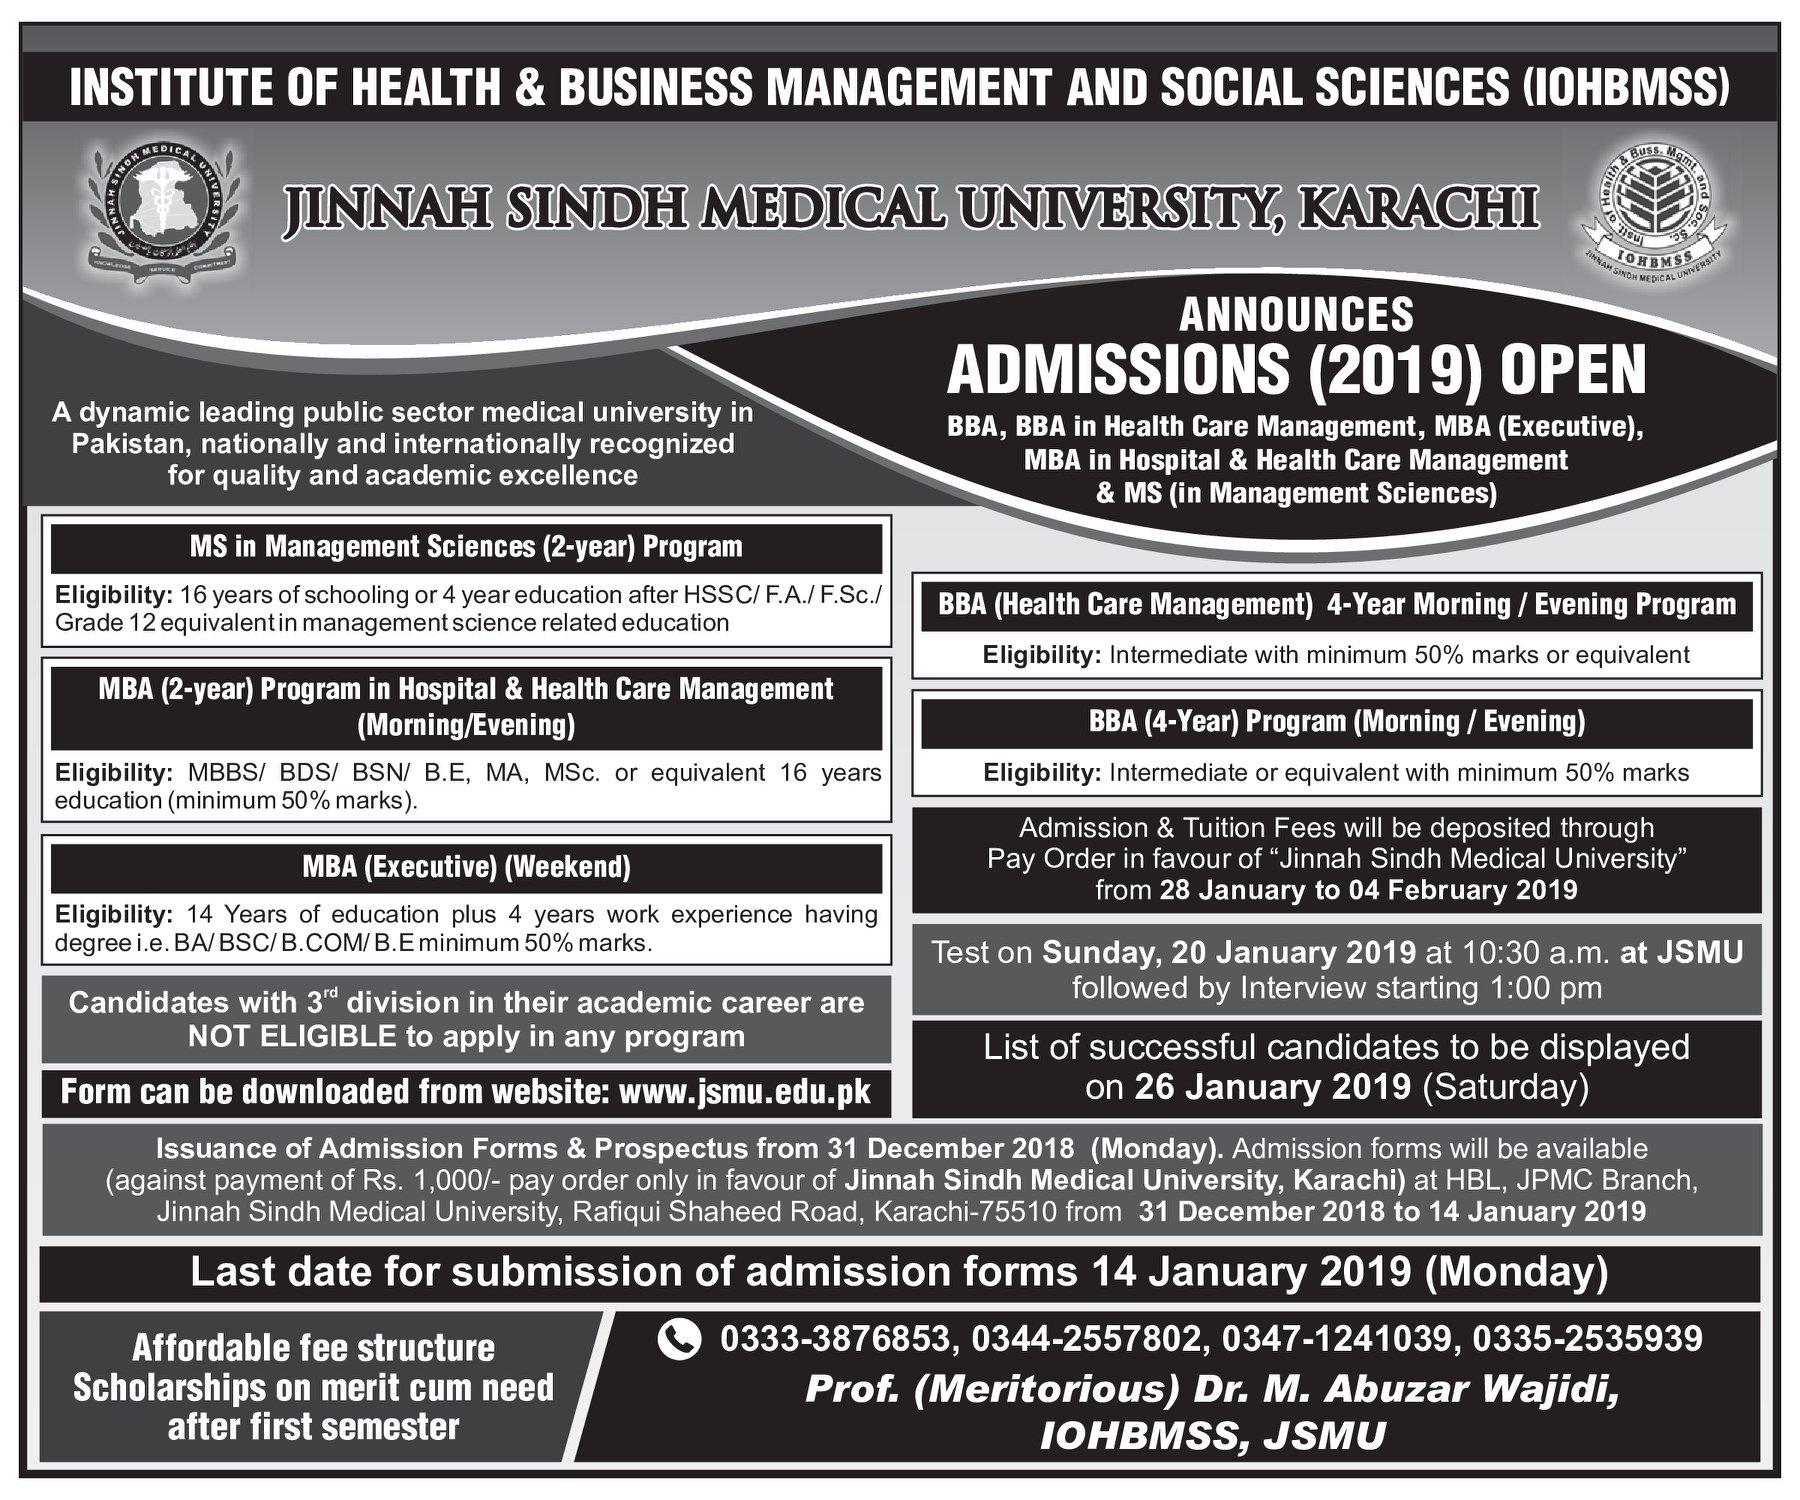 JSMU Admissions 2019 (BBA/MBA/MS)